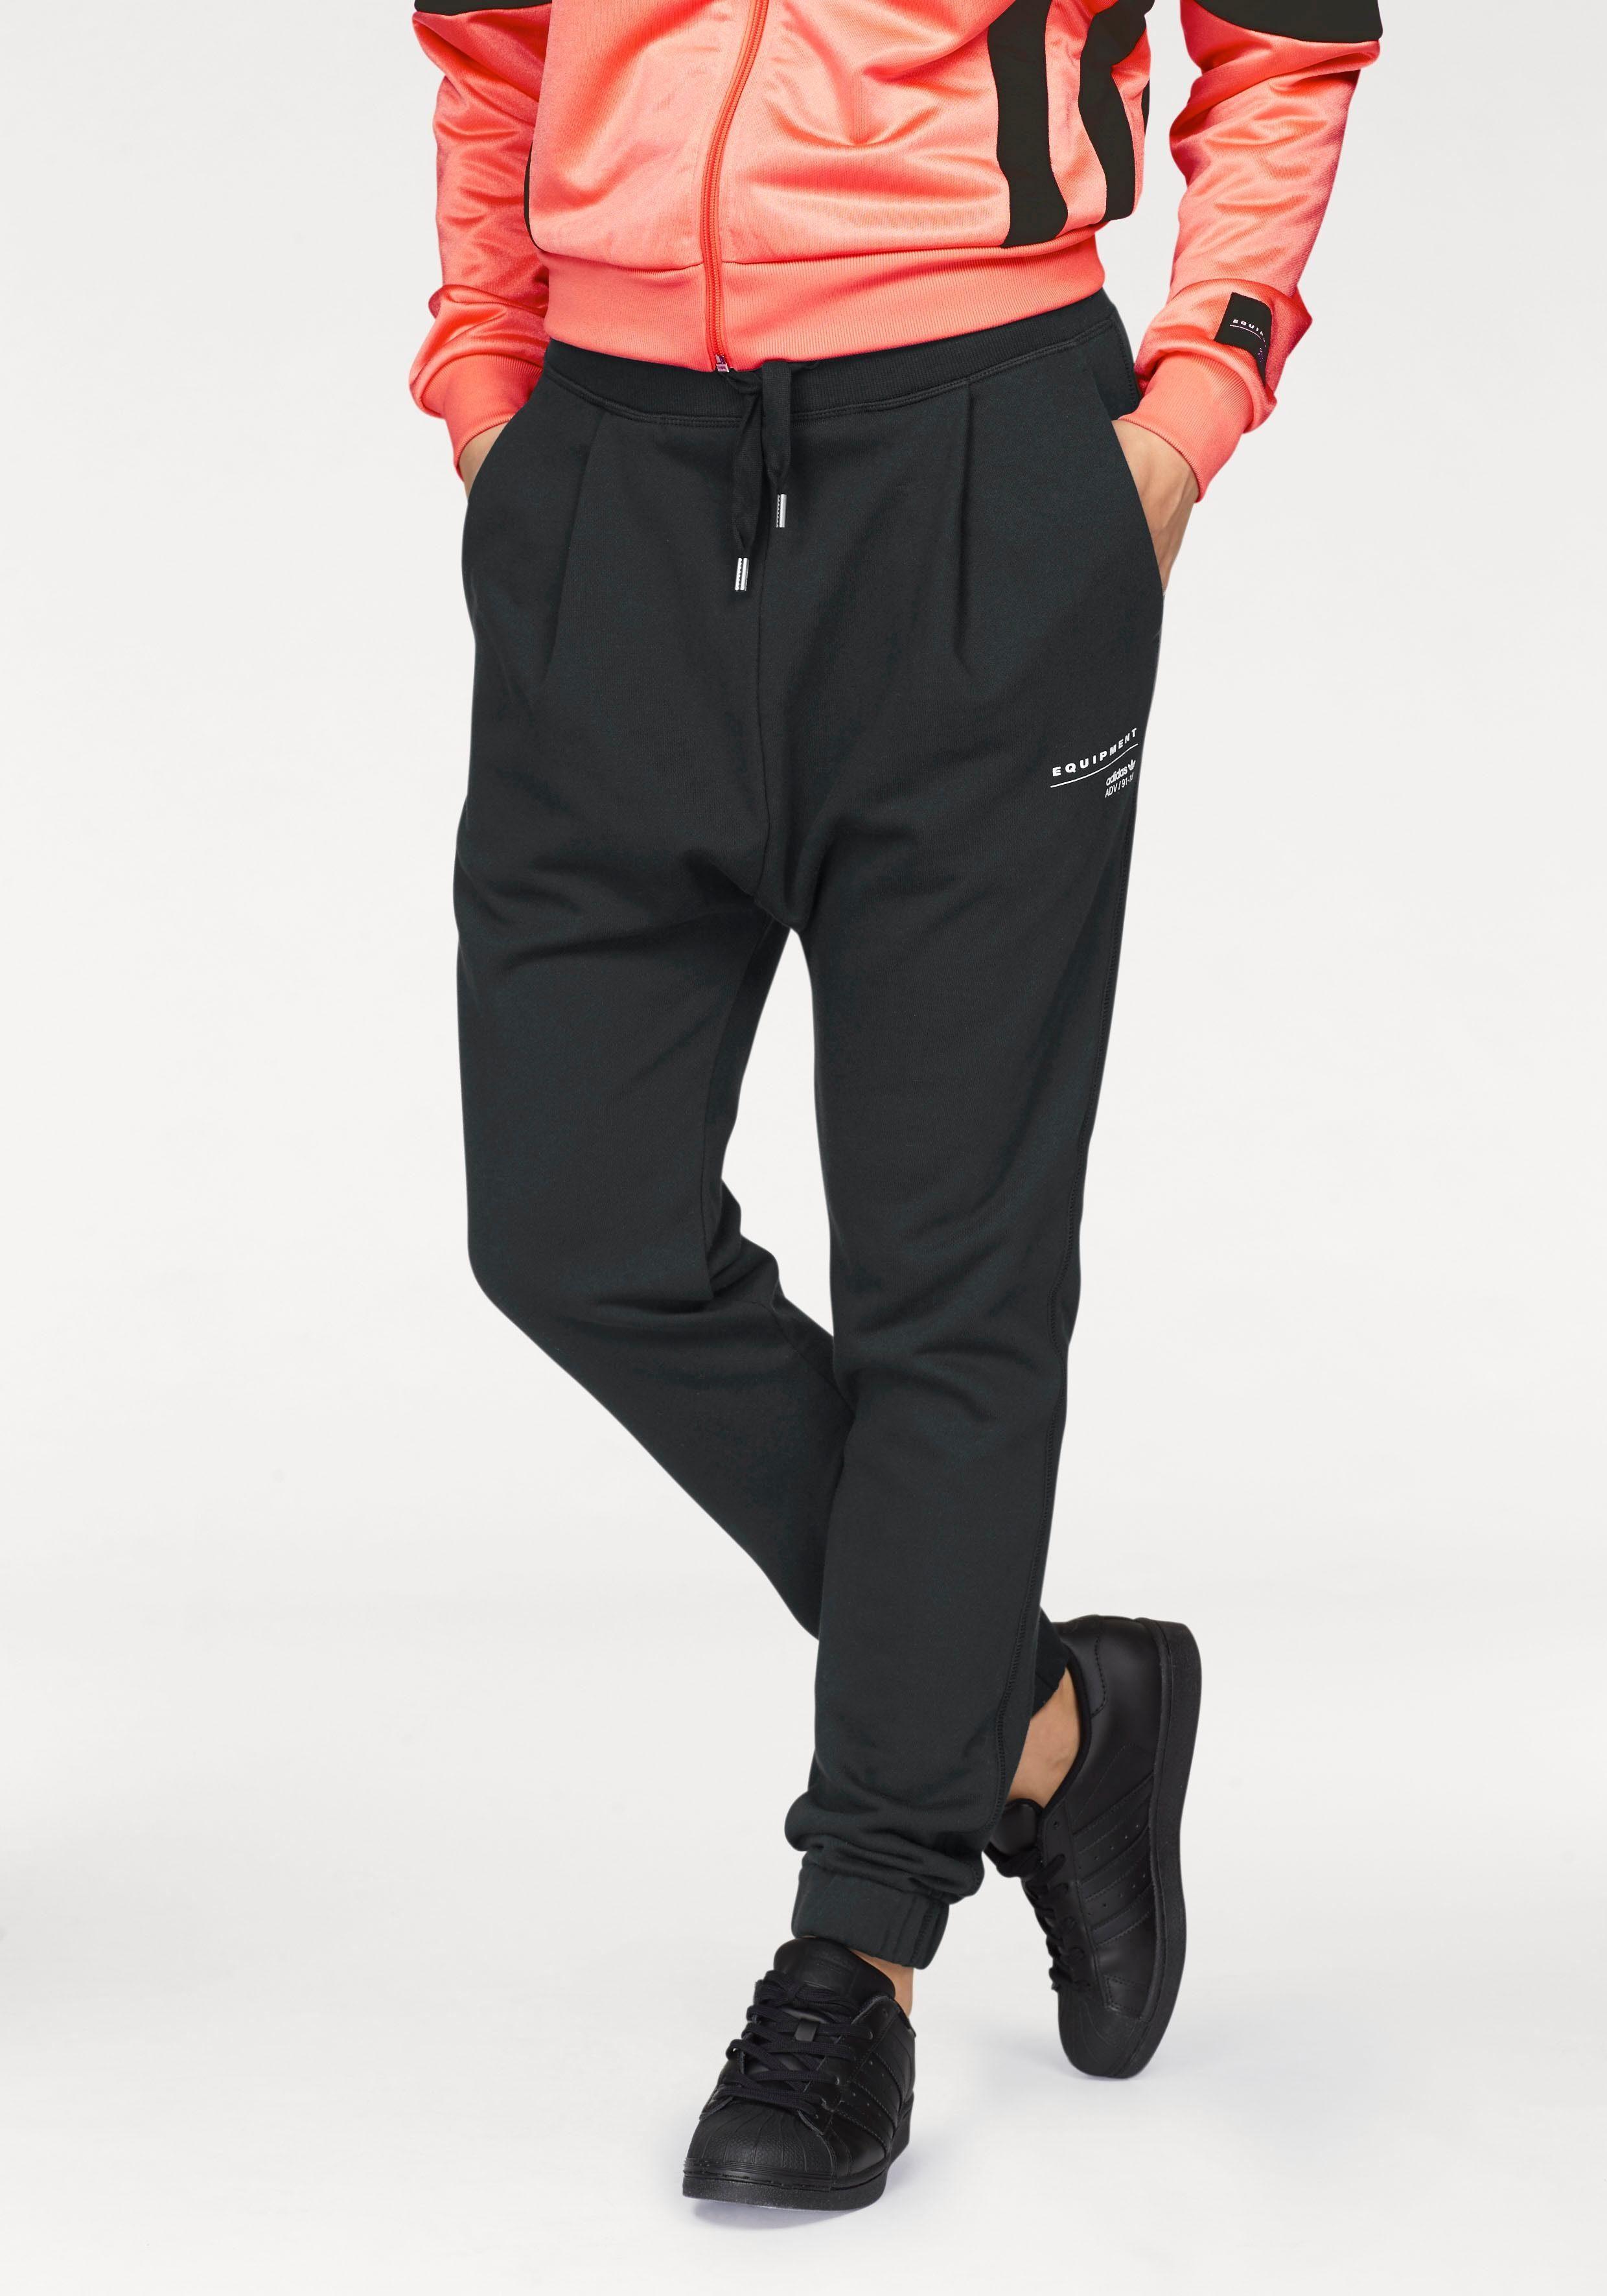 adidas Originals Jogginghose »ADIDAS EQUIPMENT PANT« Aus der EQT Serie  online kaufen | OTTO